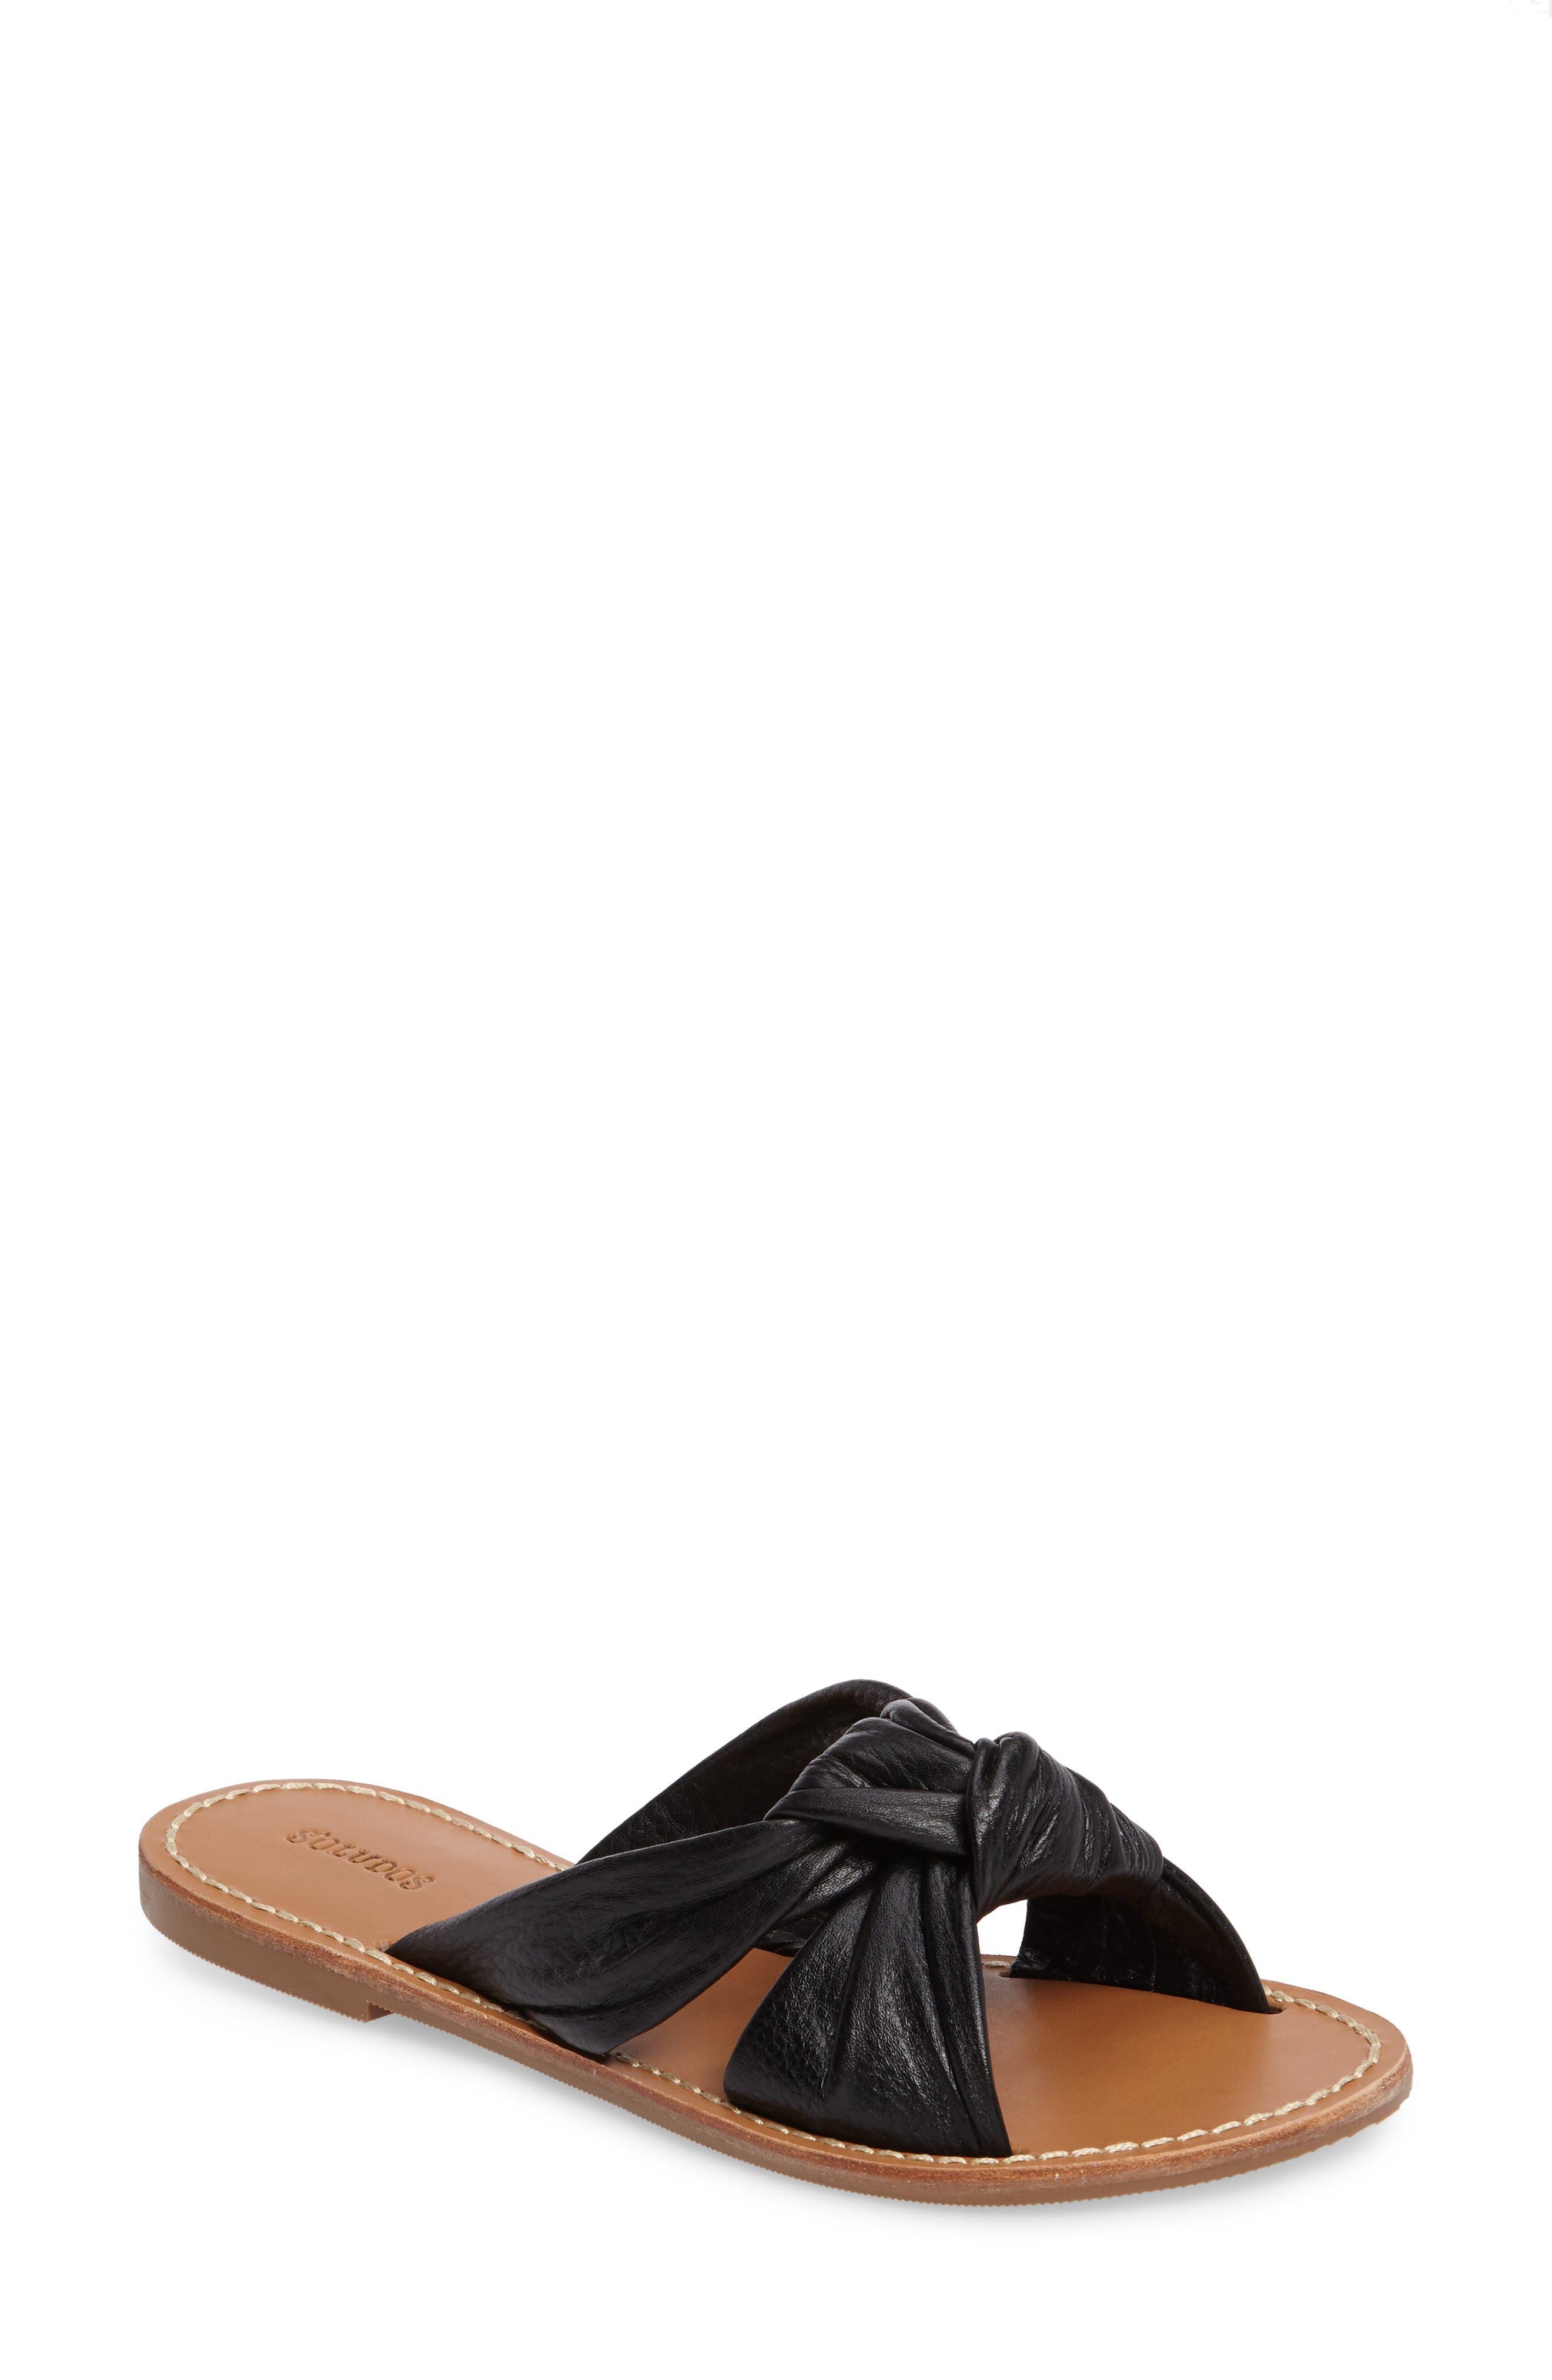 Knotted Slide Sandal,                             Main thumbnail 1, color,                             001